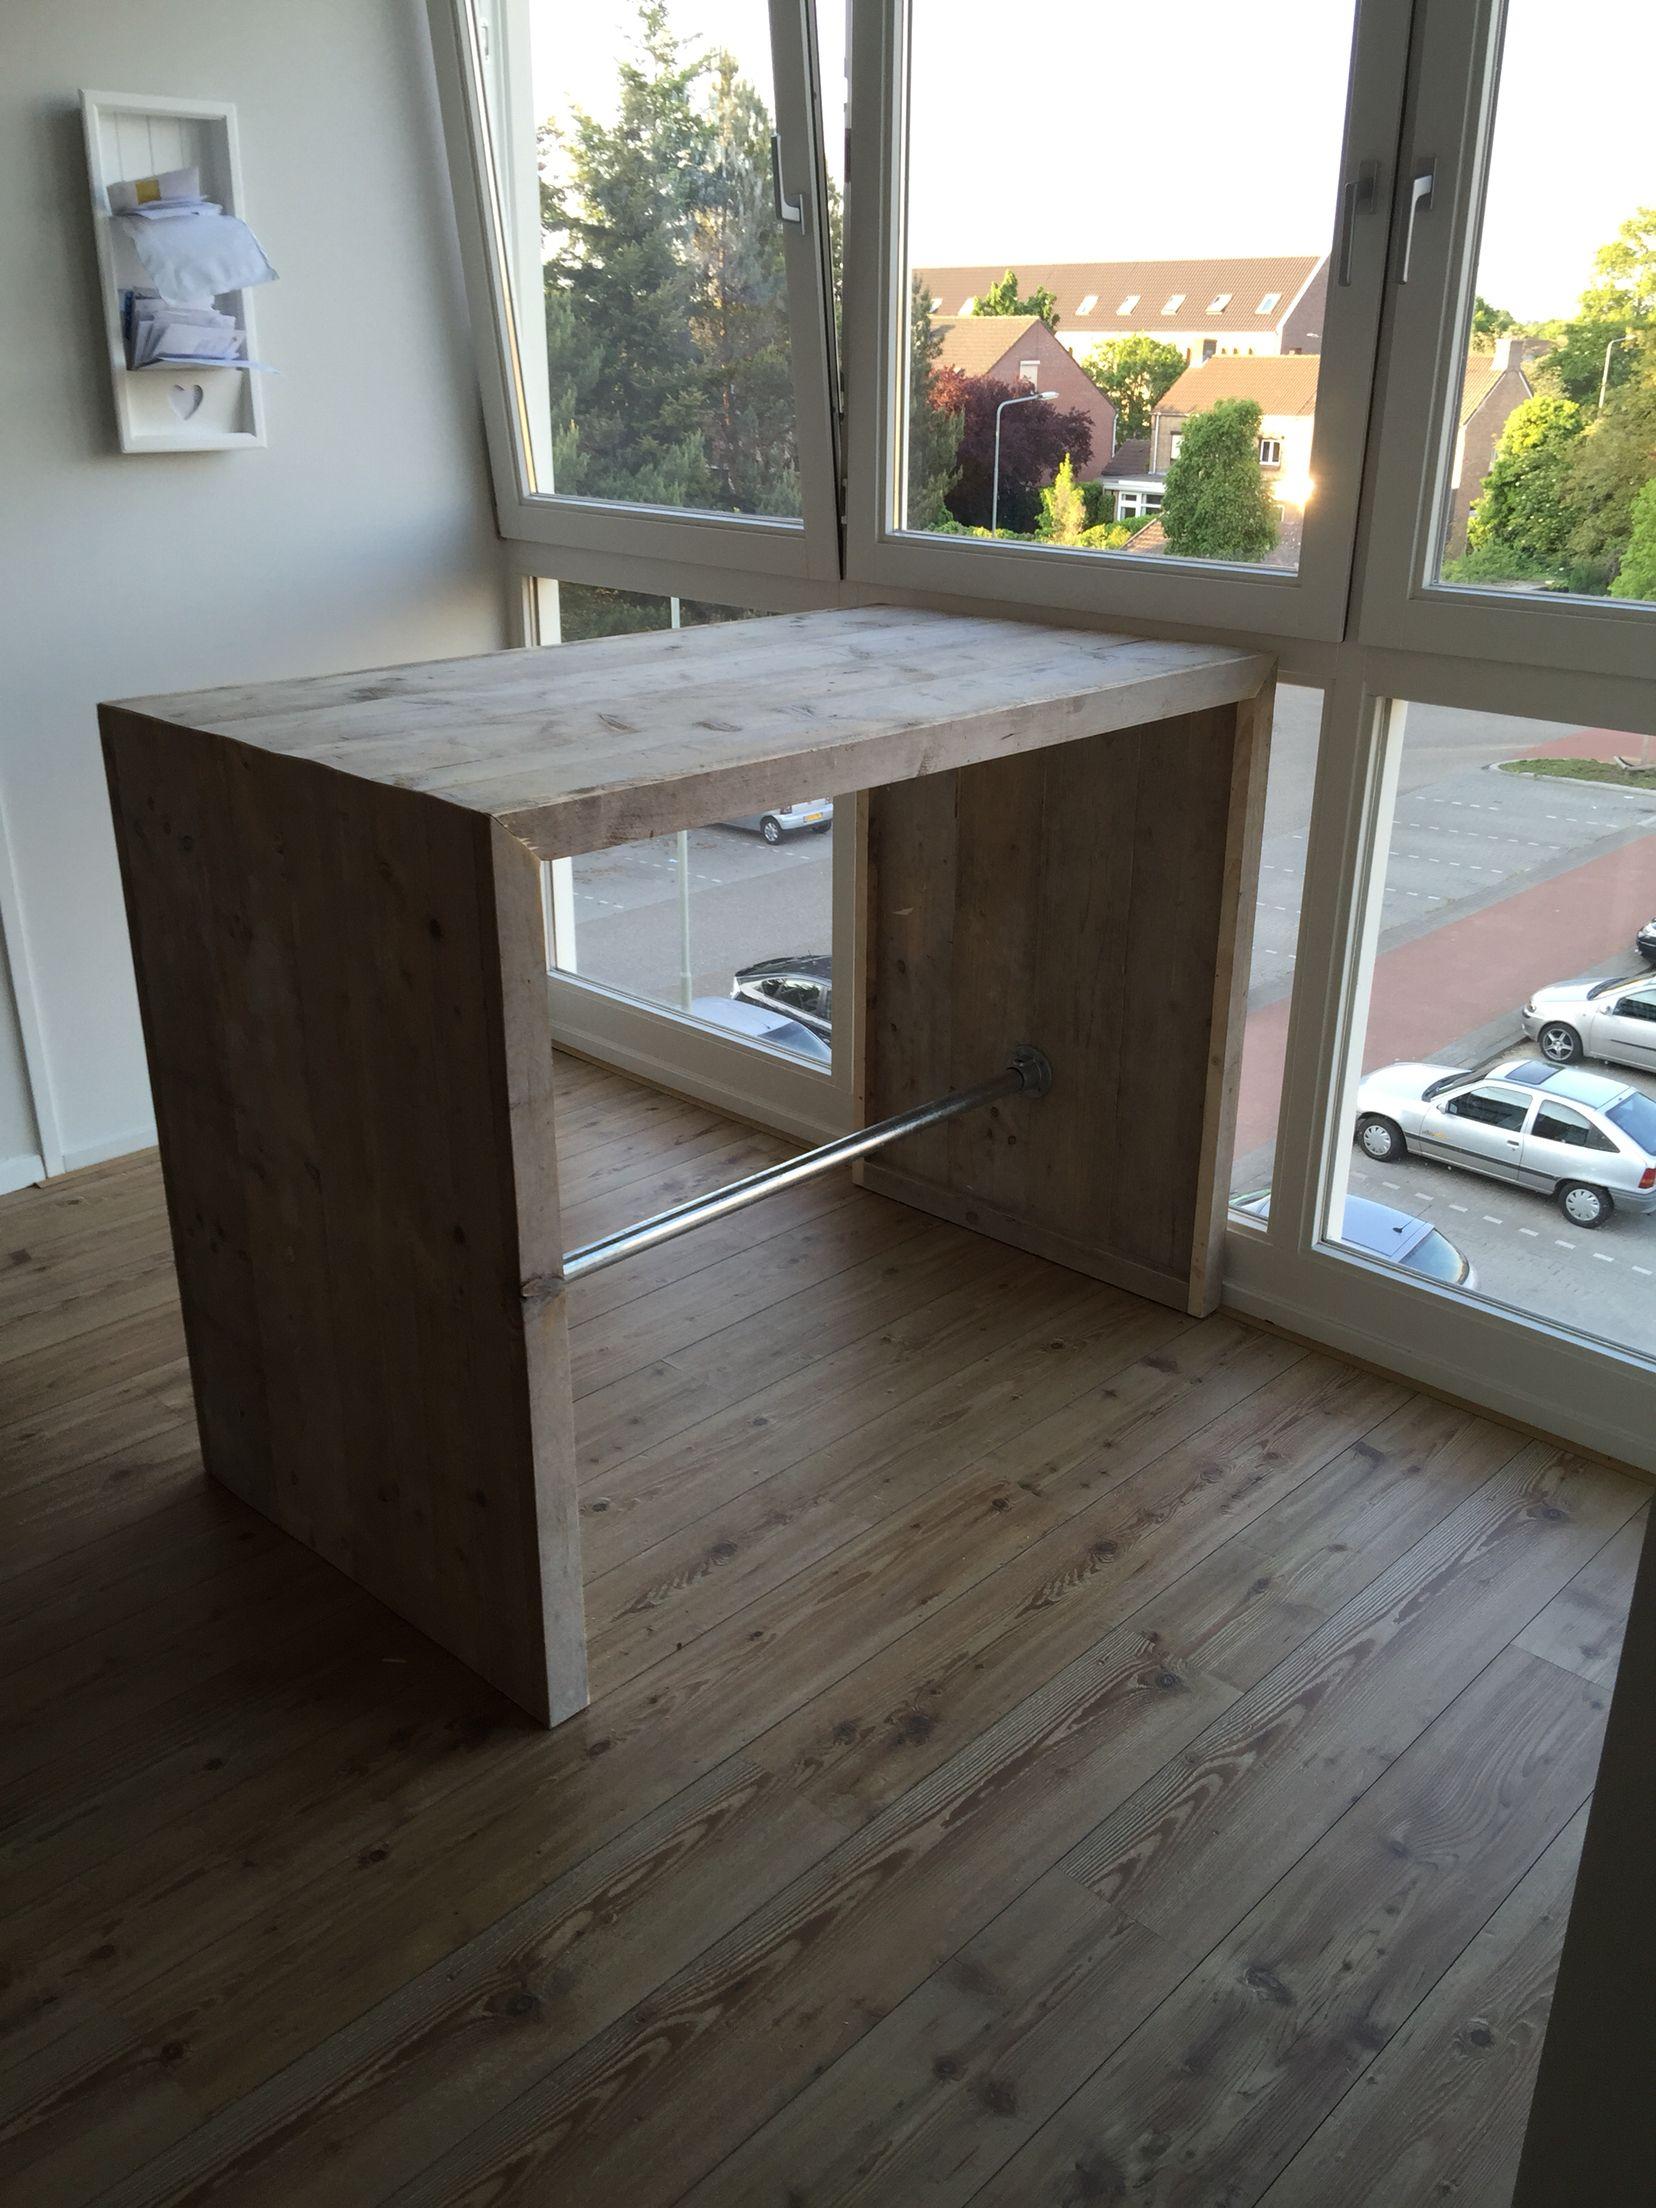 Bestaande eenvoudige keuken uitgebreid met extra keukenblok met ...